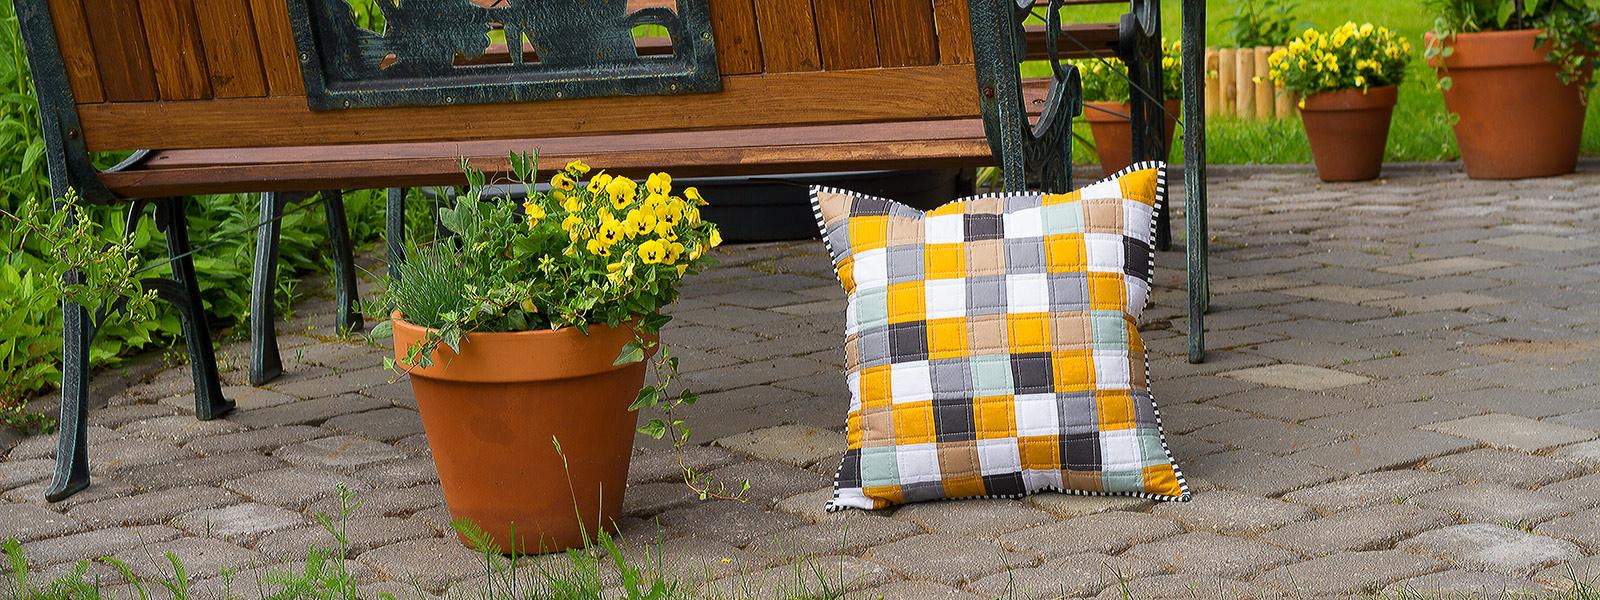 Decorative pillow next to bench